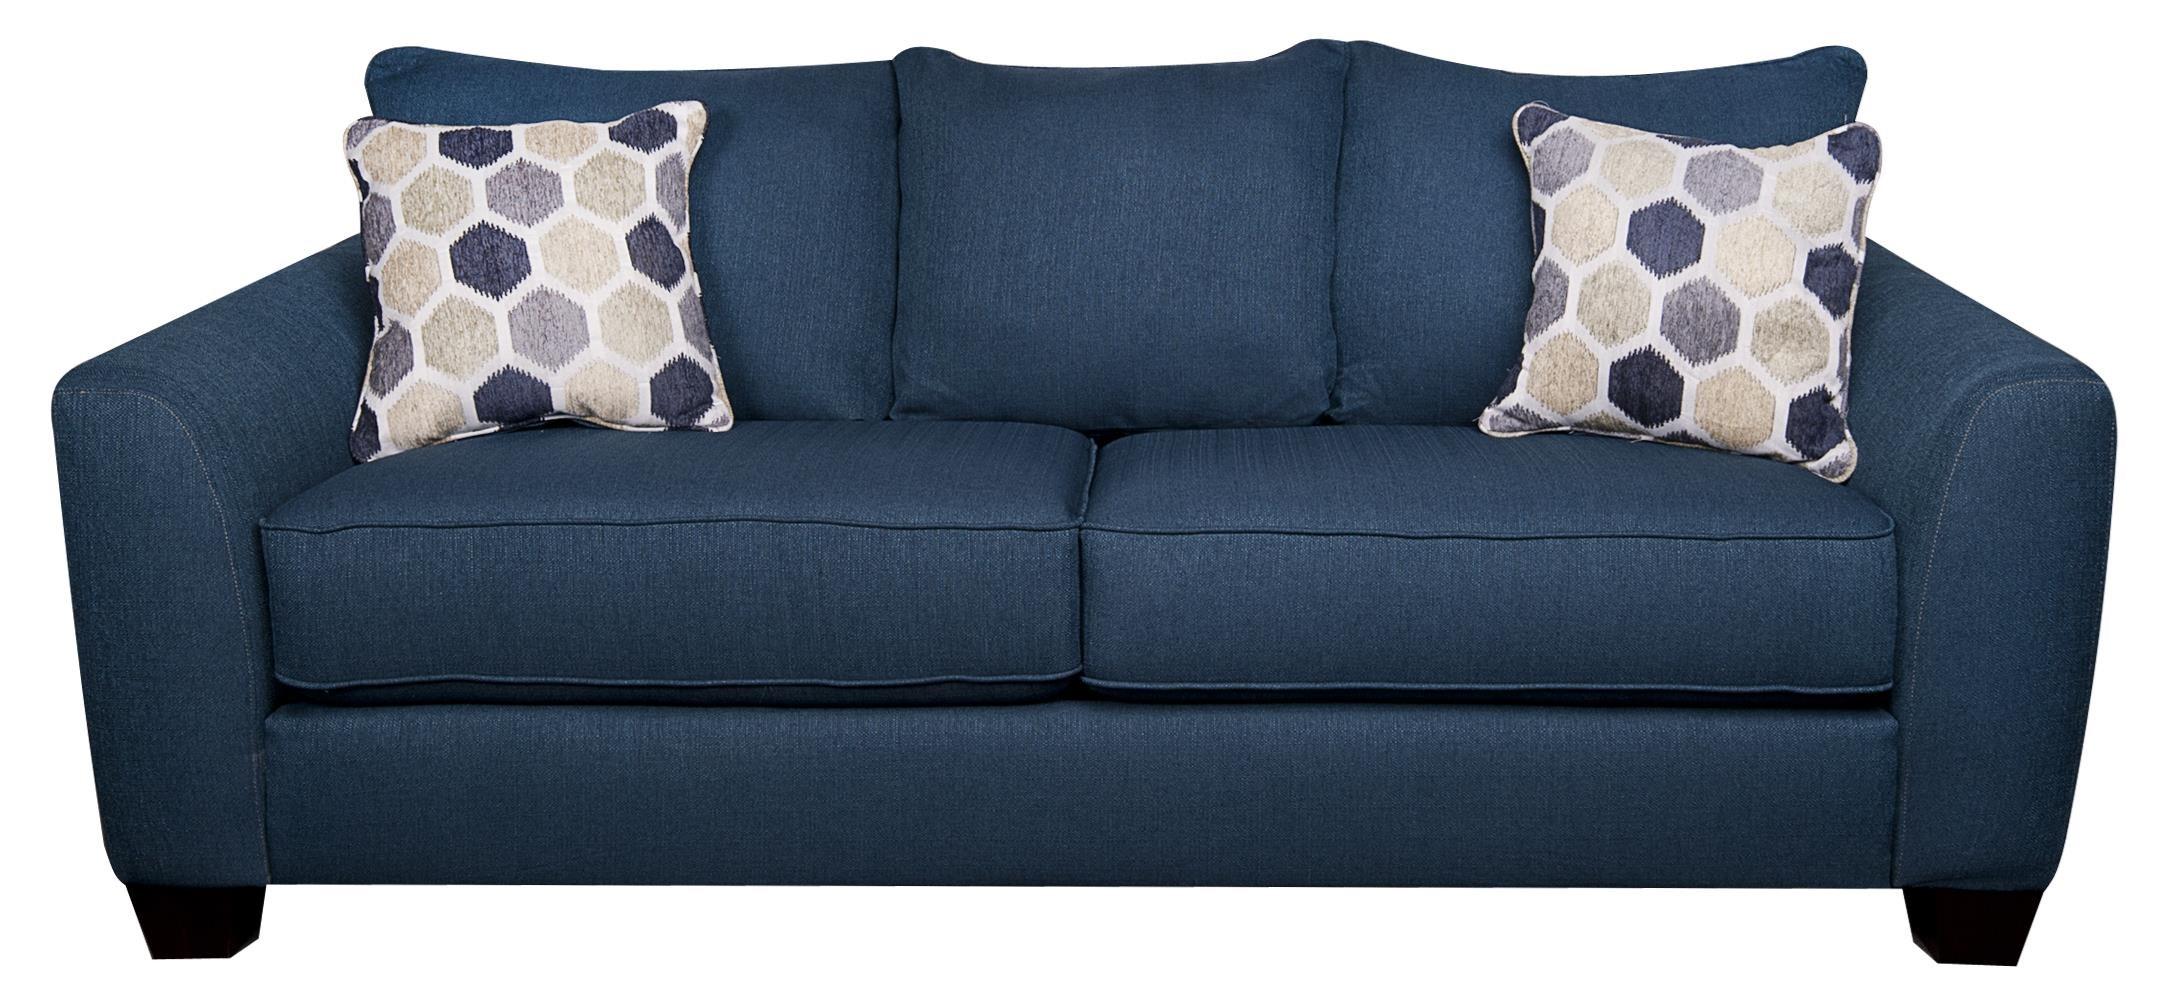 Morris Home Remedy Remedy Sofa - Item Number: 540442556